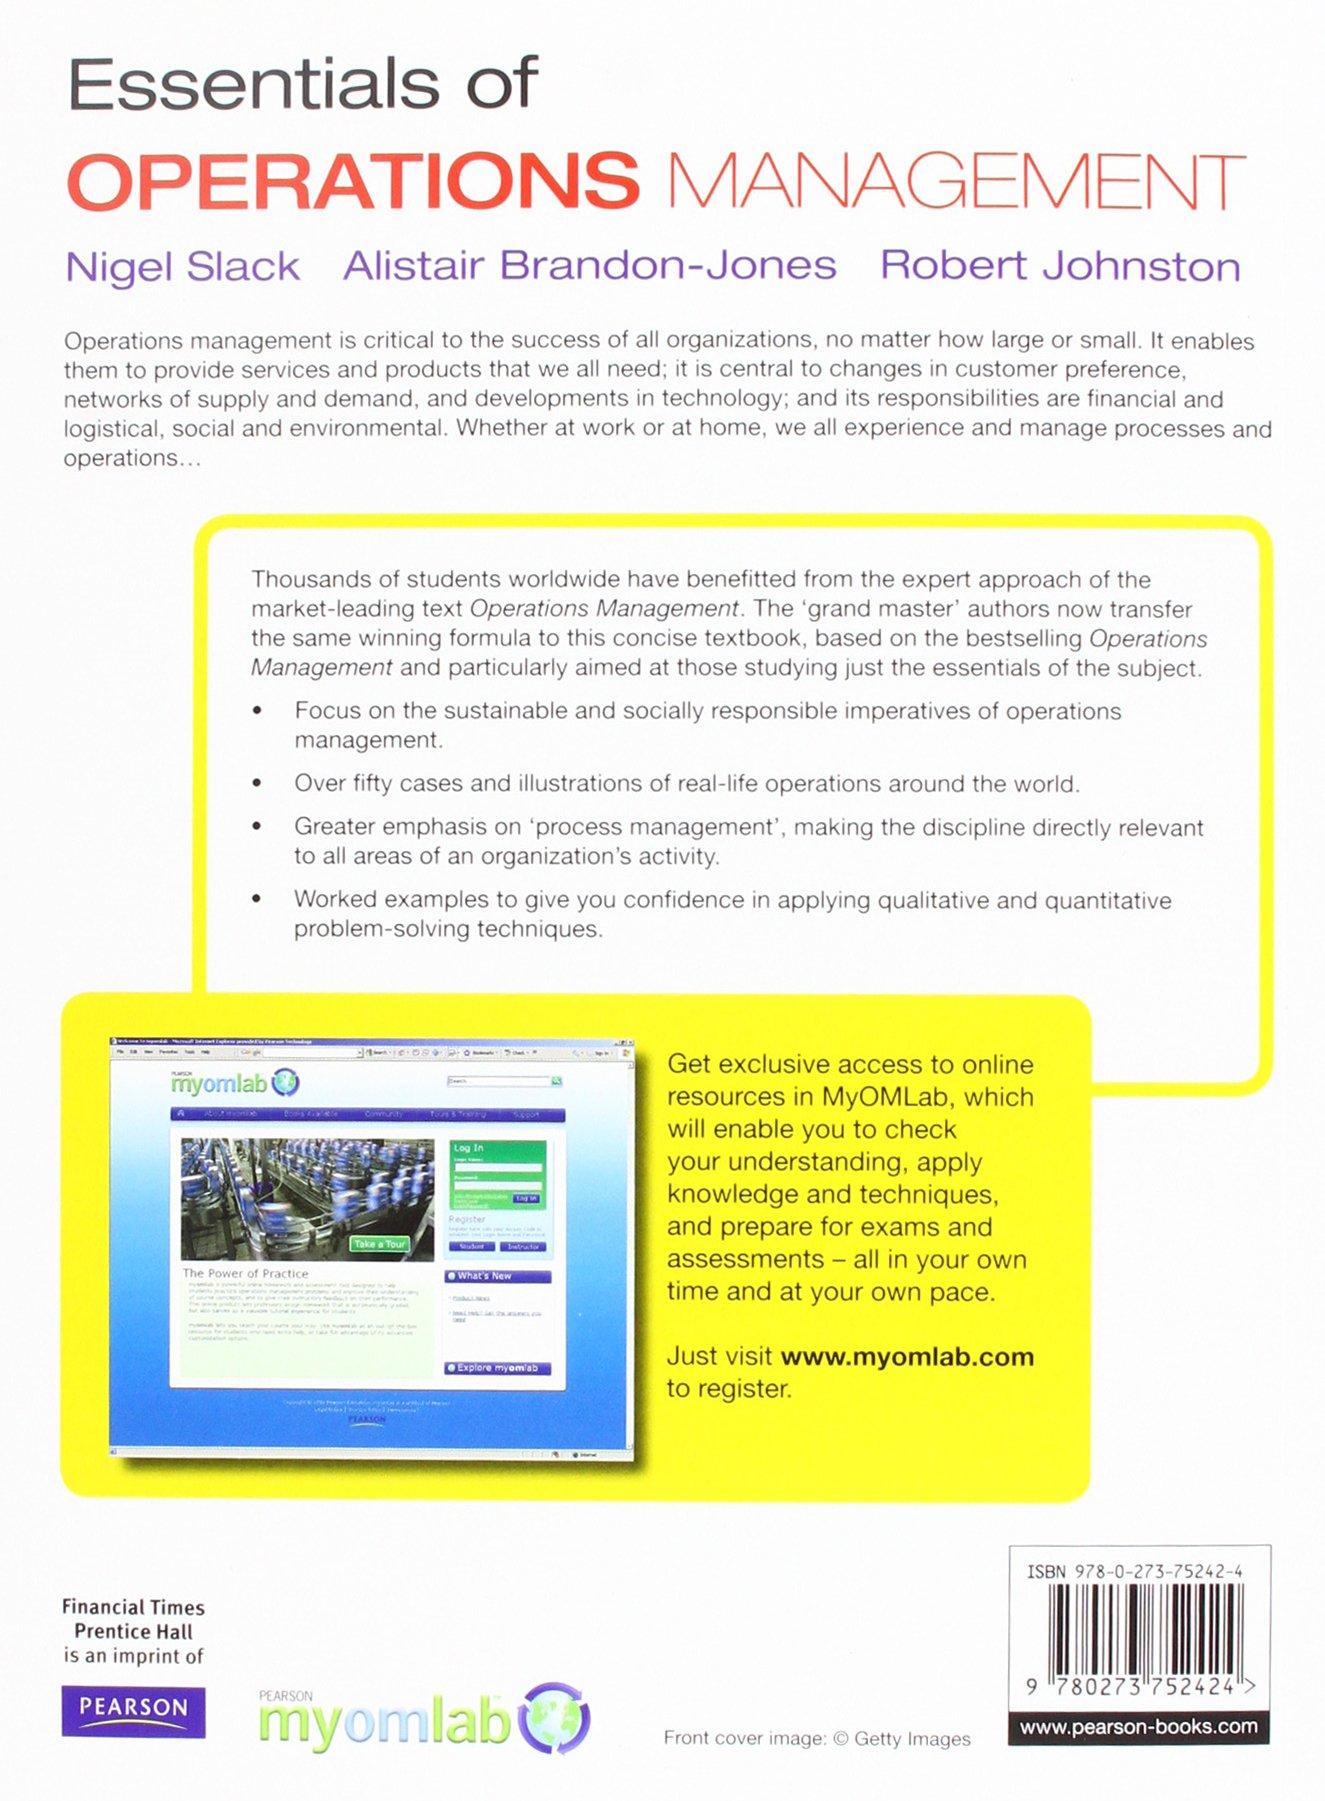 Essentials of Operations Management with MyOMLab: Amazon.co.uk: Prof Nigel  Slack, Prof Alistair Brandon-Jones, Prof Robert Johnston: 9781292182353:  Books